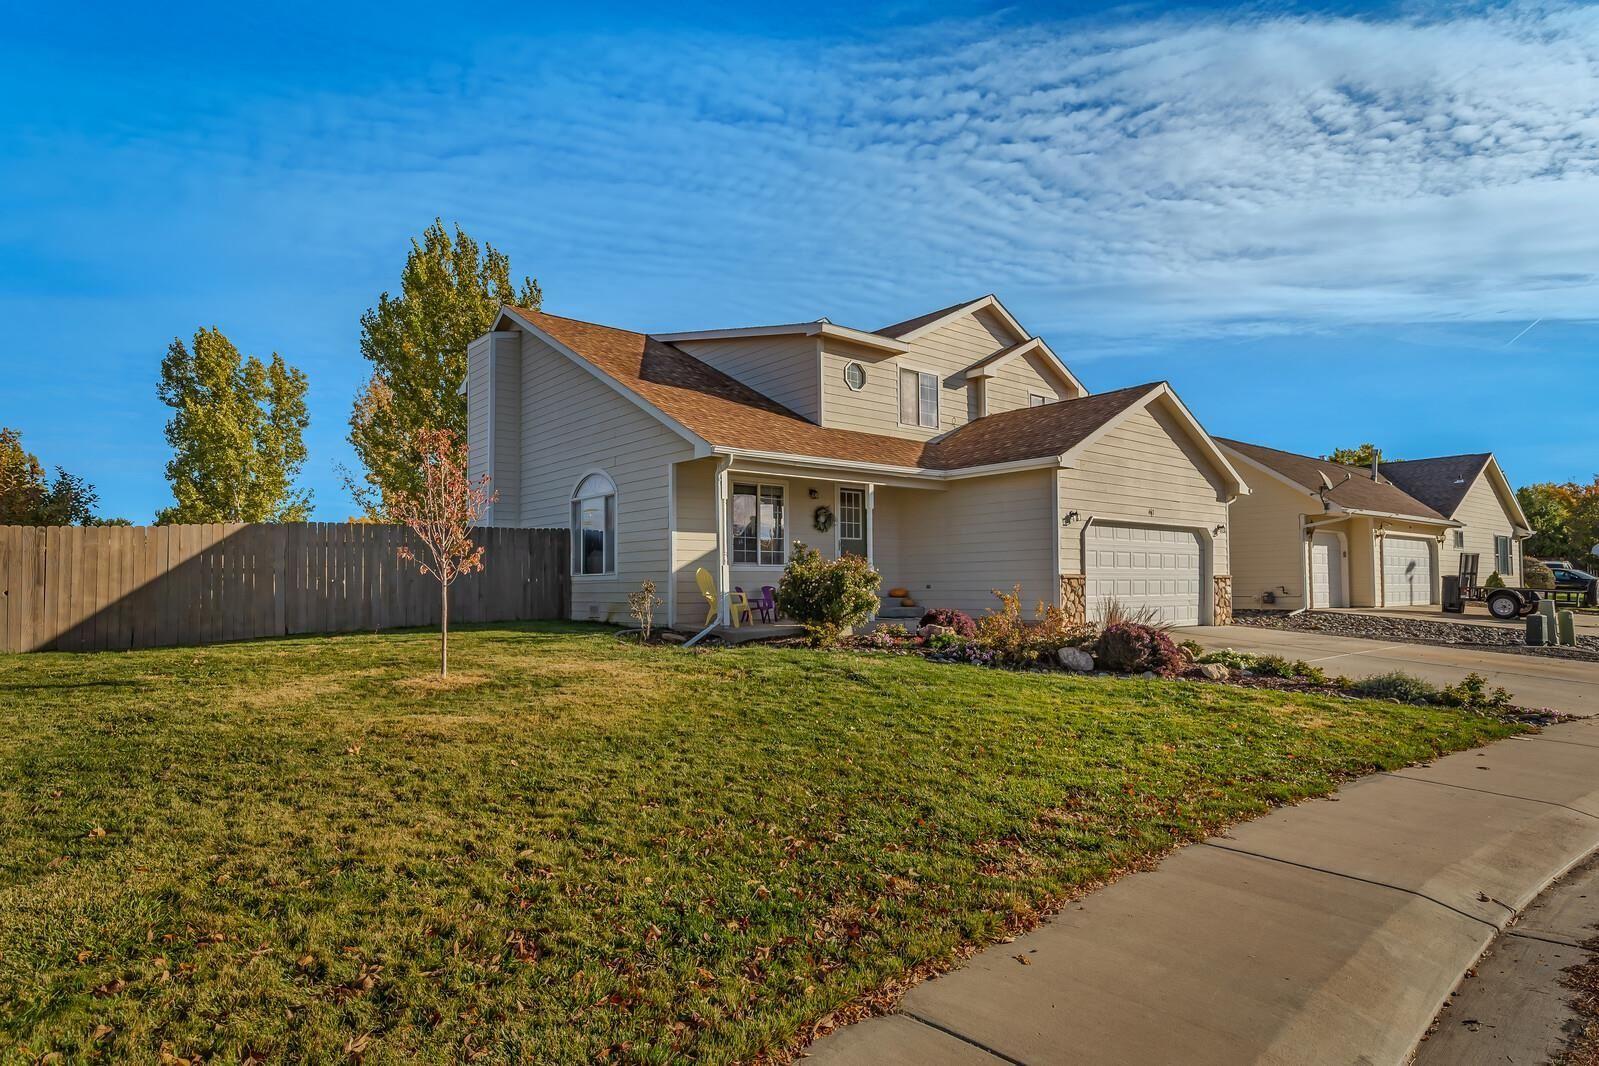 Photo of 467 Morning Dove Street, Grand Junction, CO 81504 (MLS # 20215735)